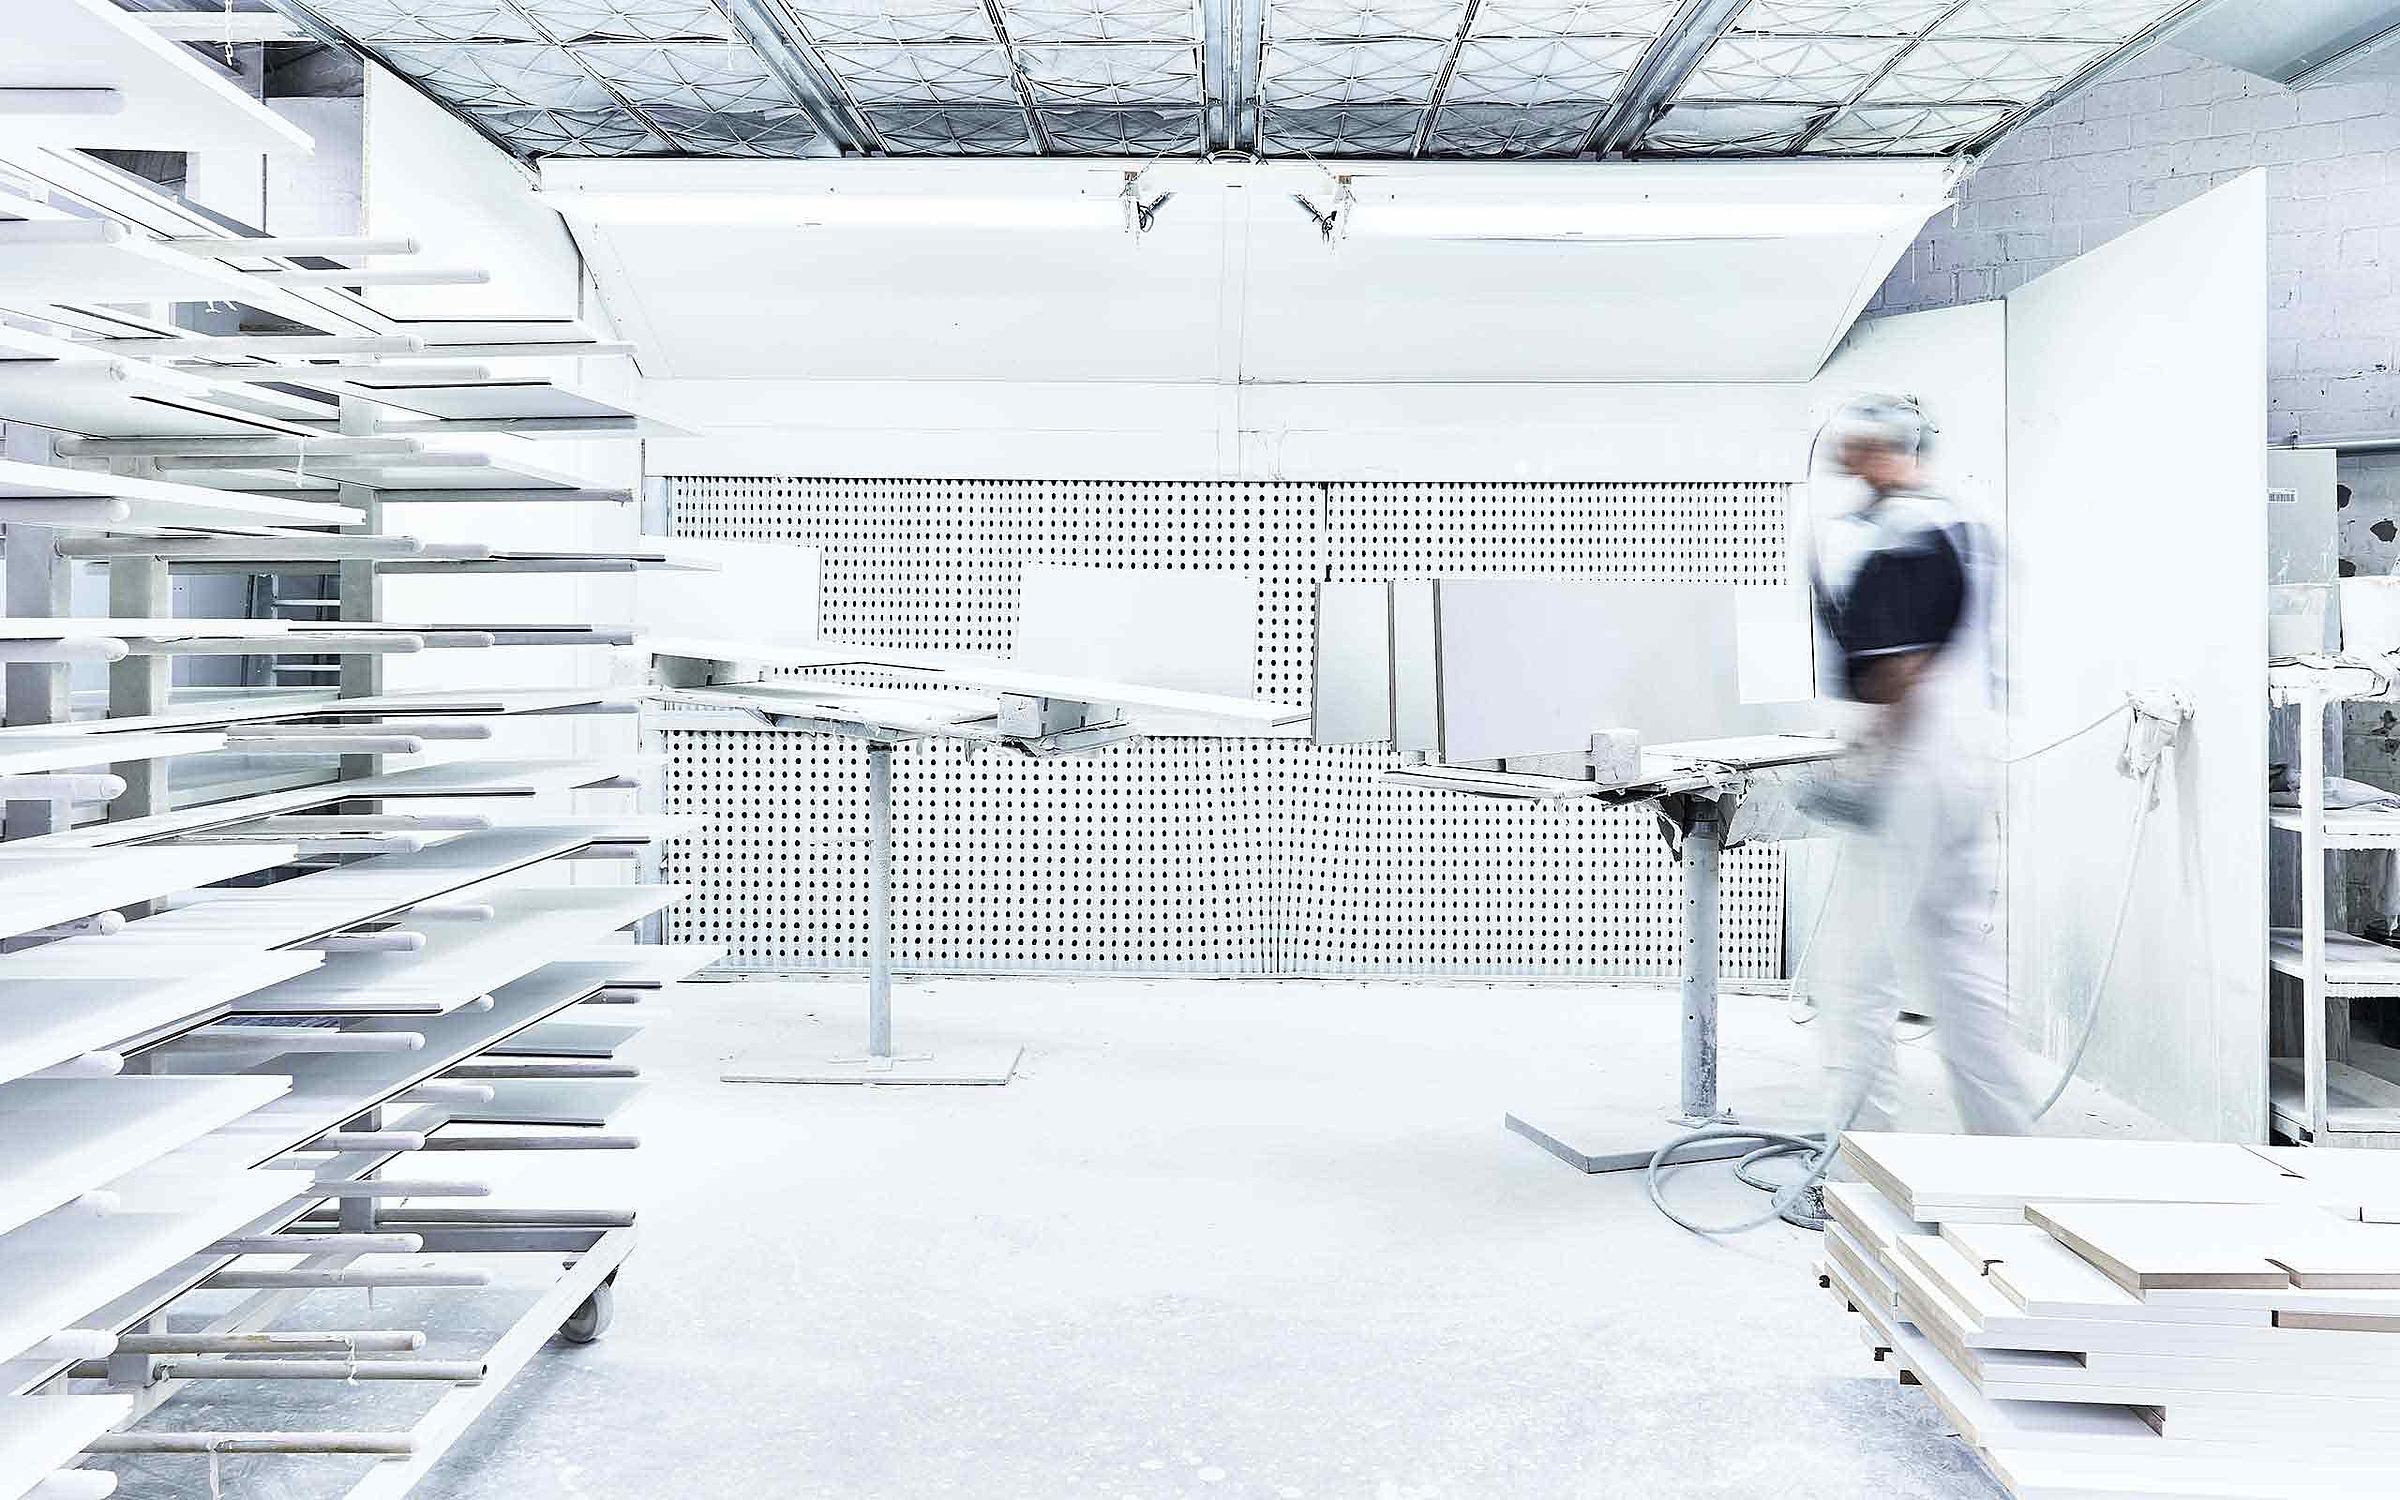 RMW Standort Rietberg Produktion Lack